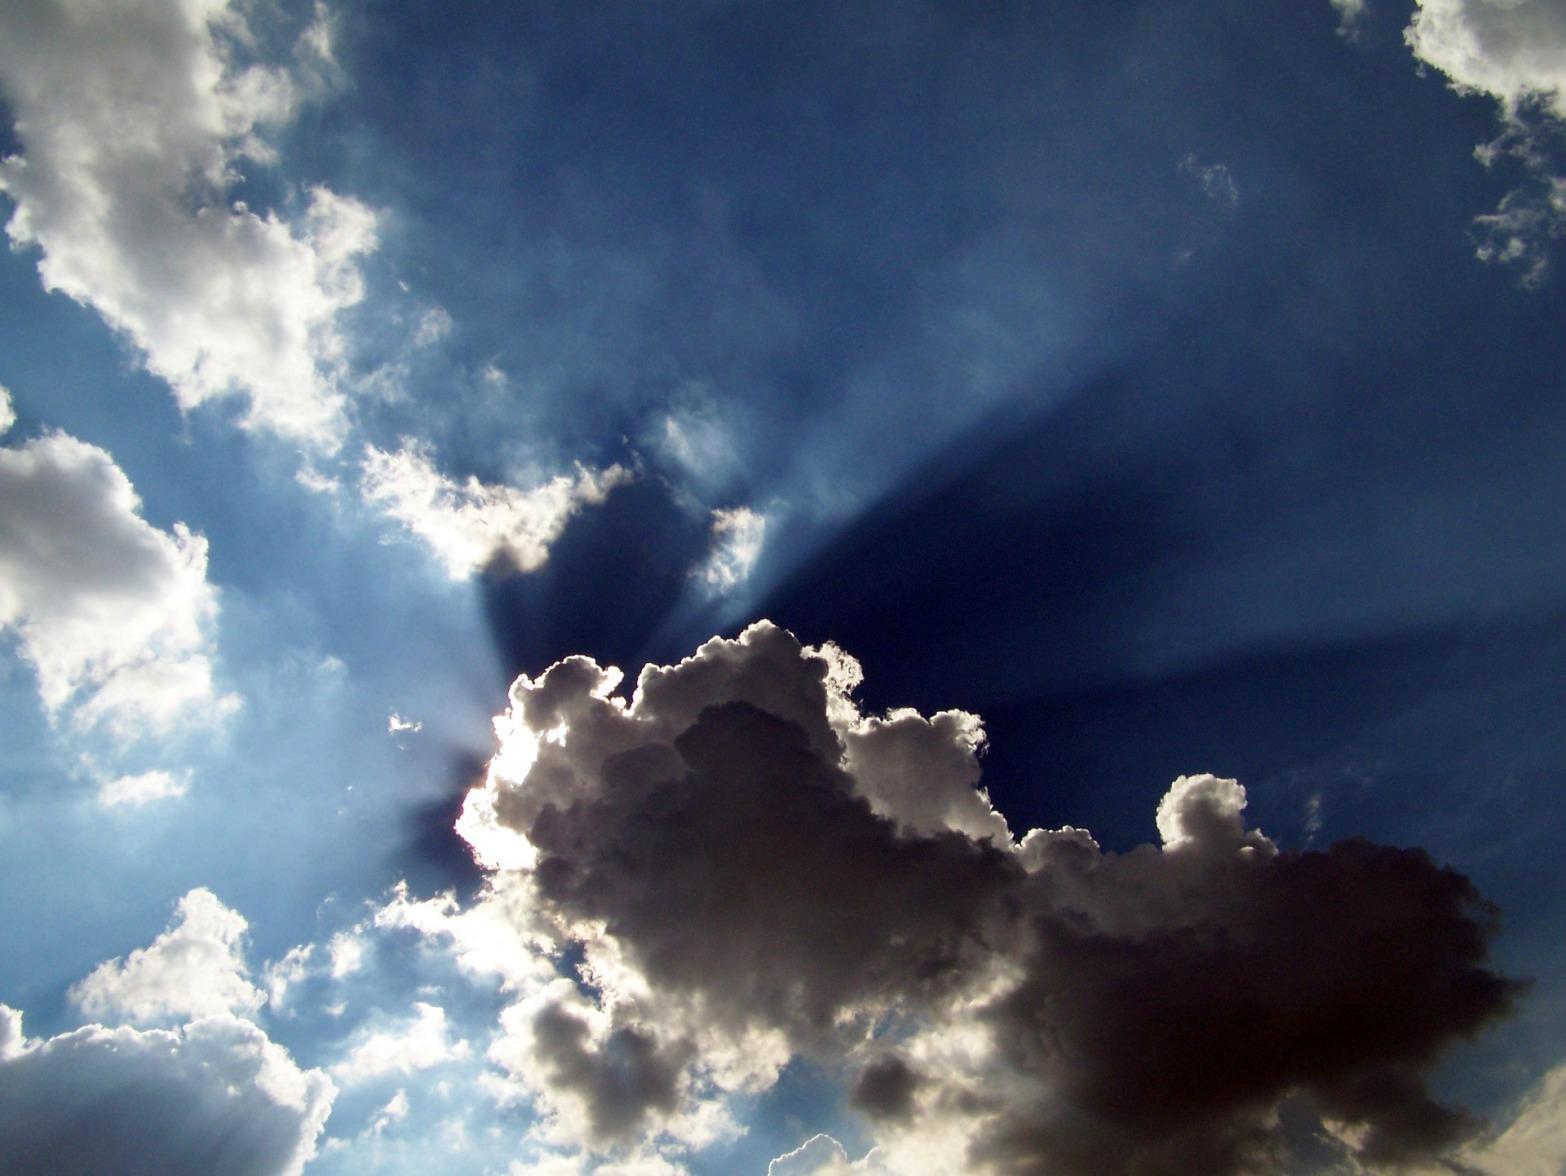 clouds-17812_1920.jpg